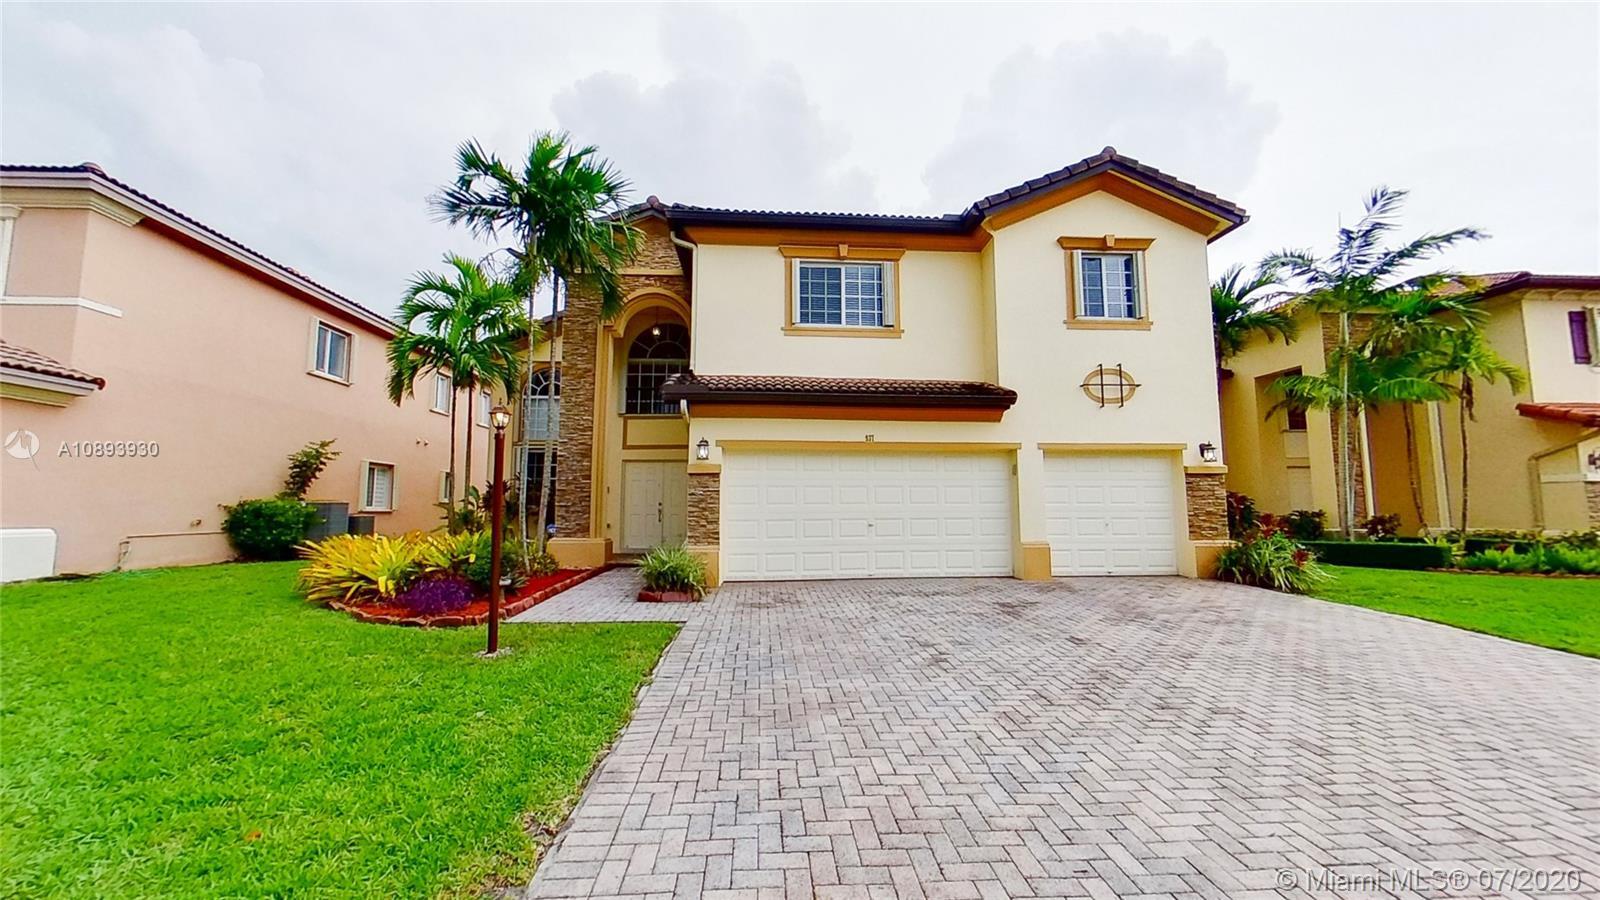 937 NE 36th Ave Property Photo - Homestead, FL real estate listing